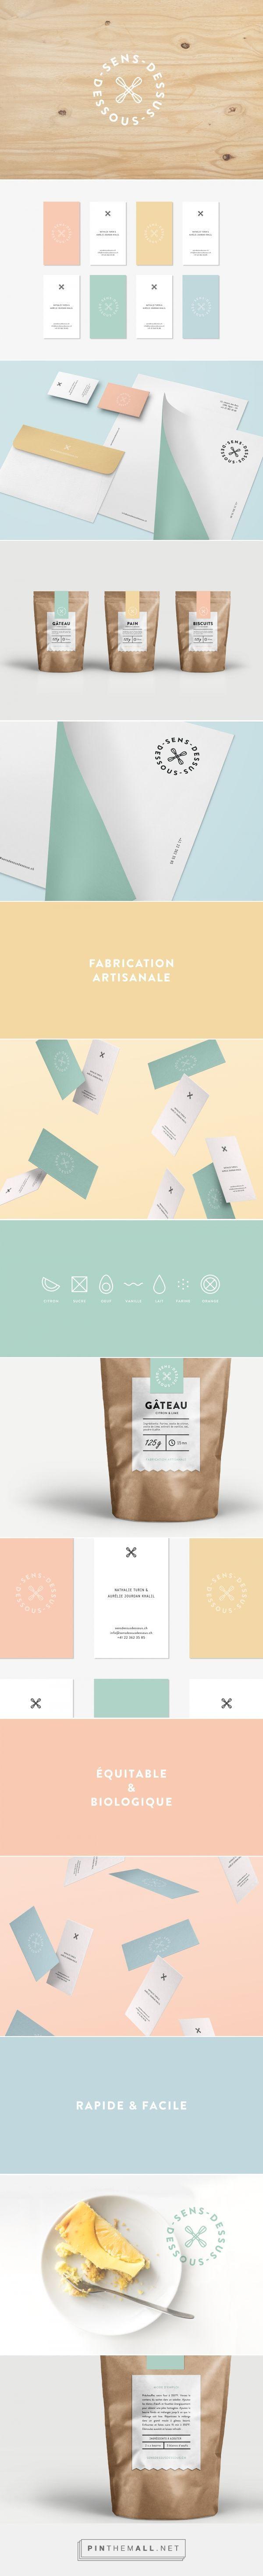 Sens-dessus-dessous on Behance   Fivestar Branding – Design and Branding Agency & Inspiration Gallery